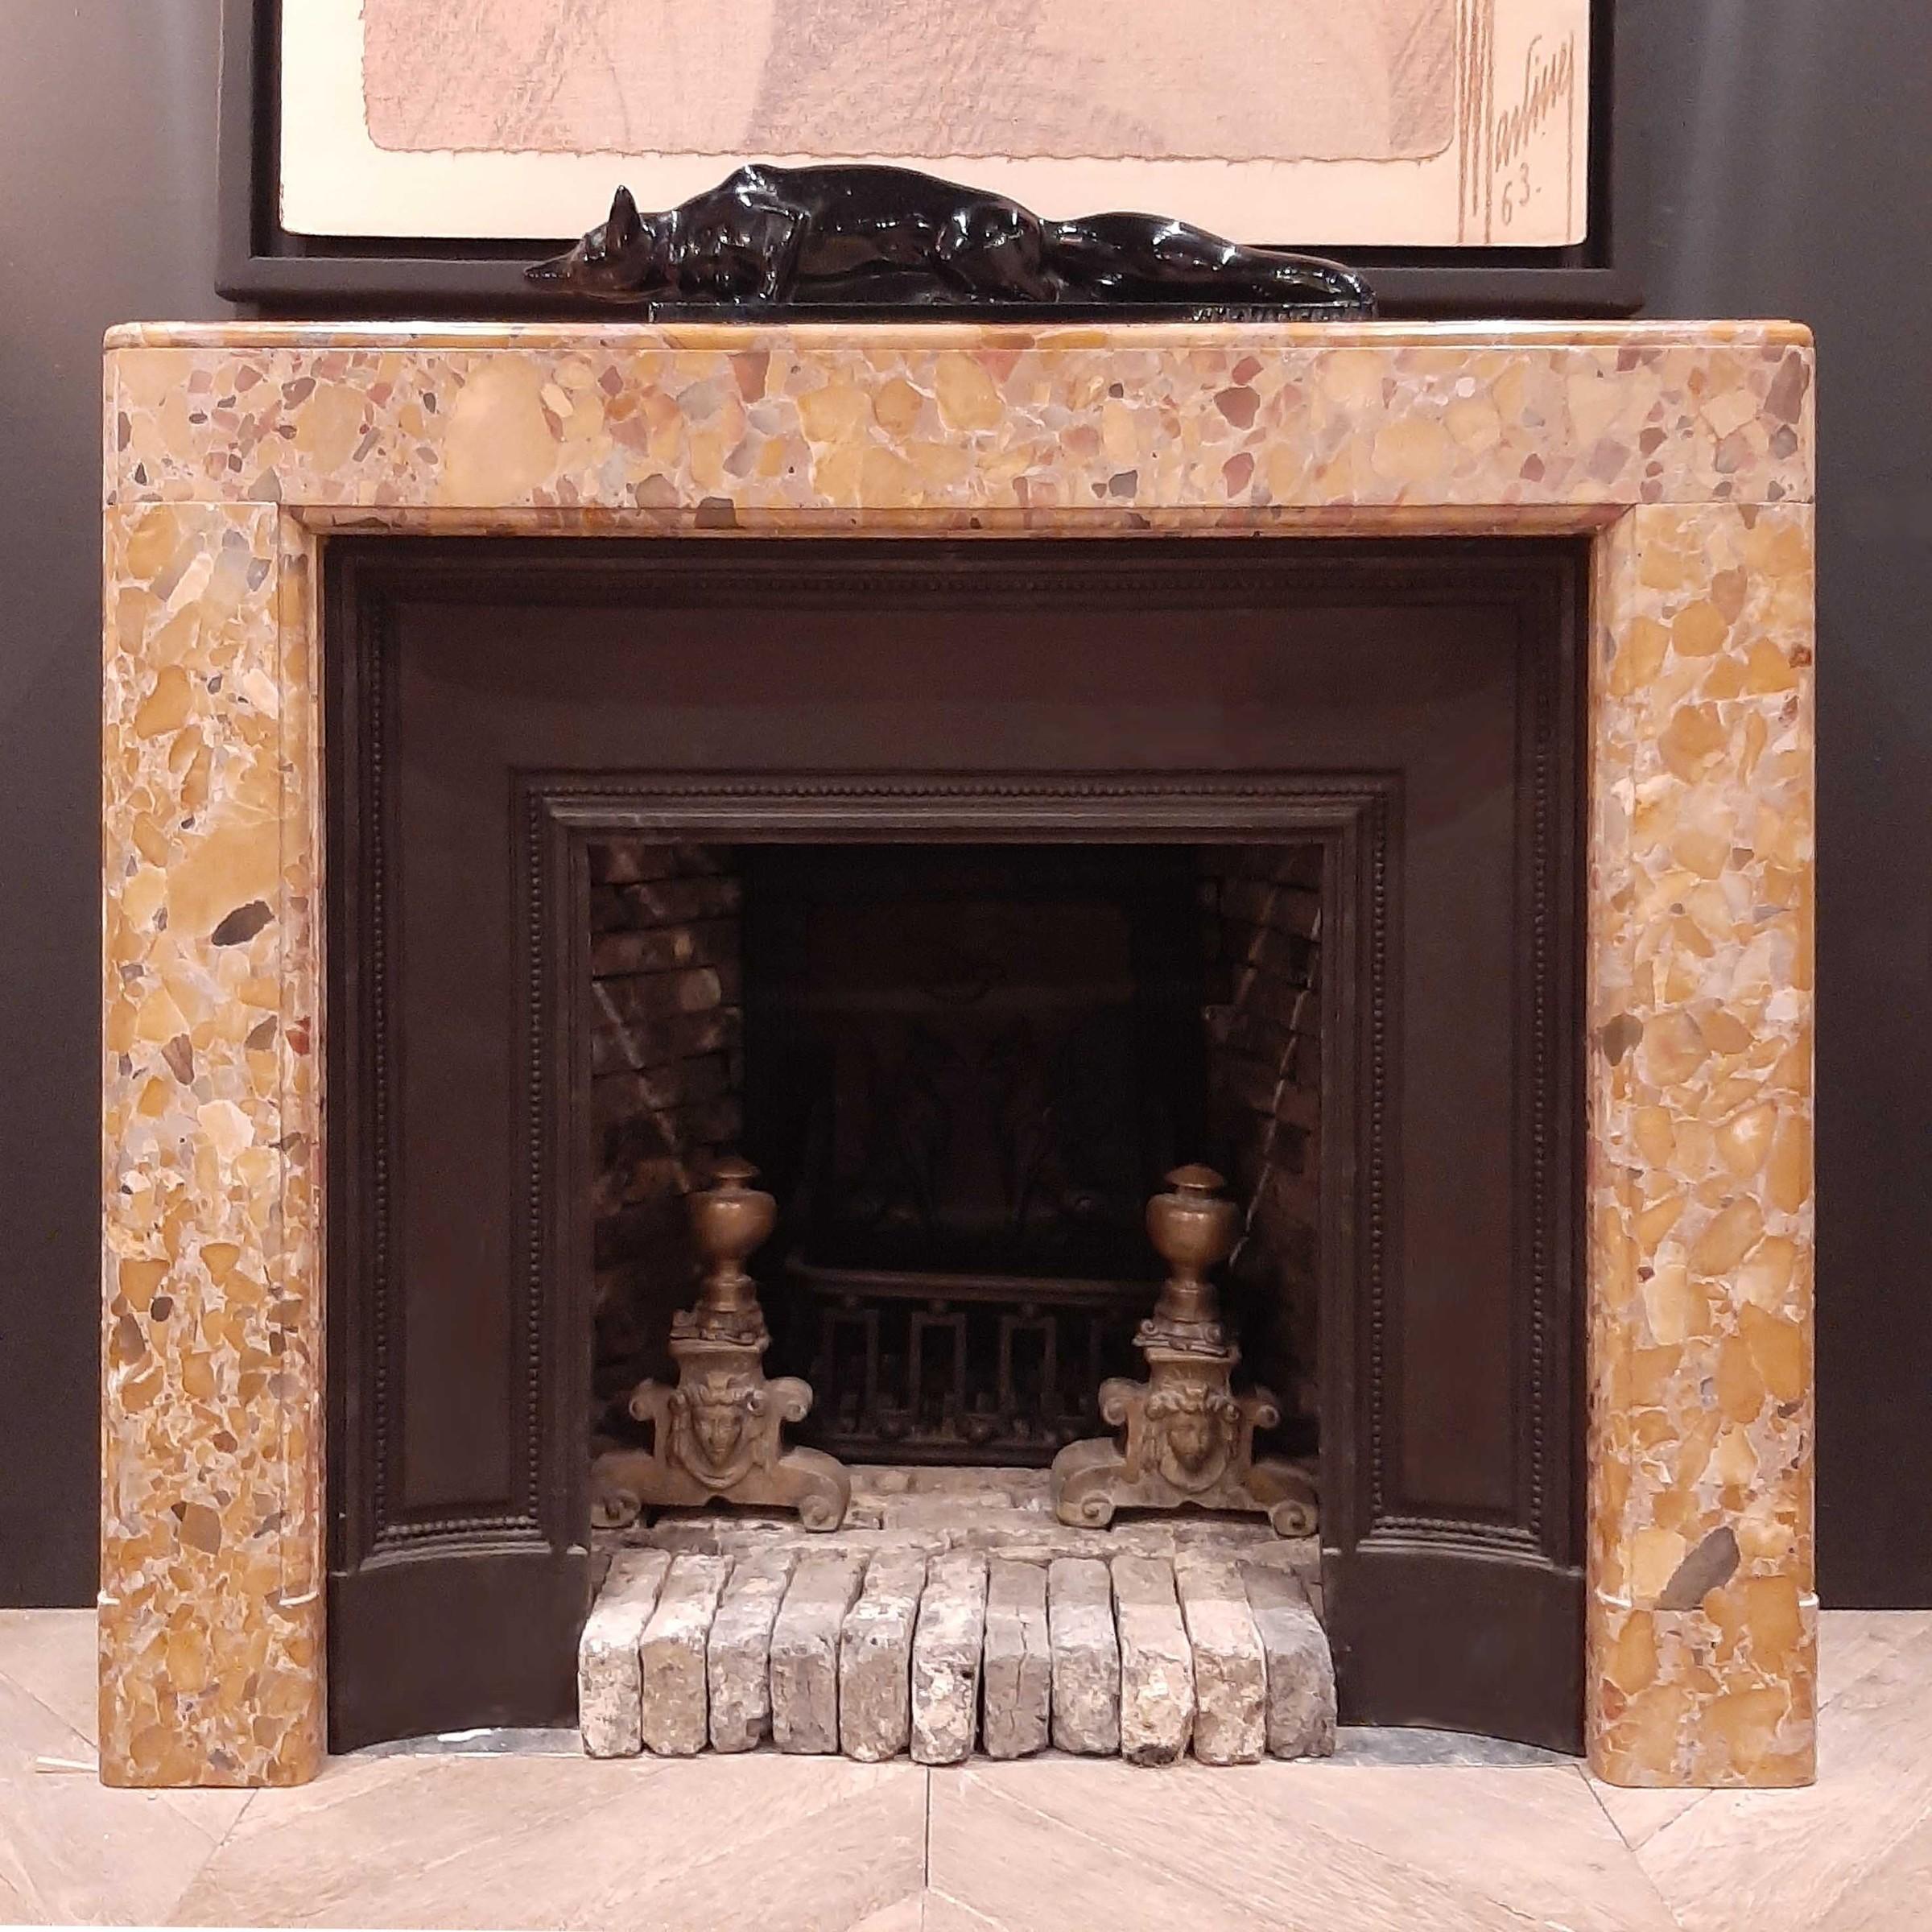 Marble Art Deco fireplace with original cast-iron interior